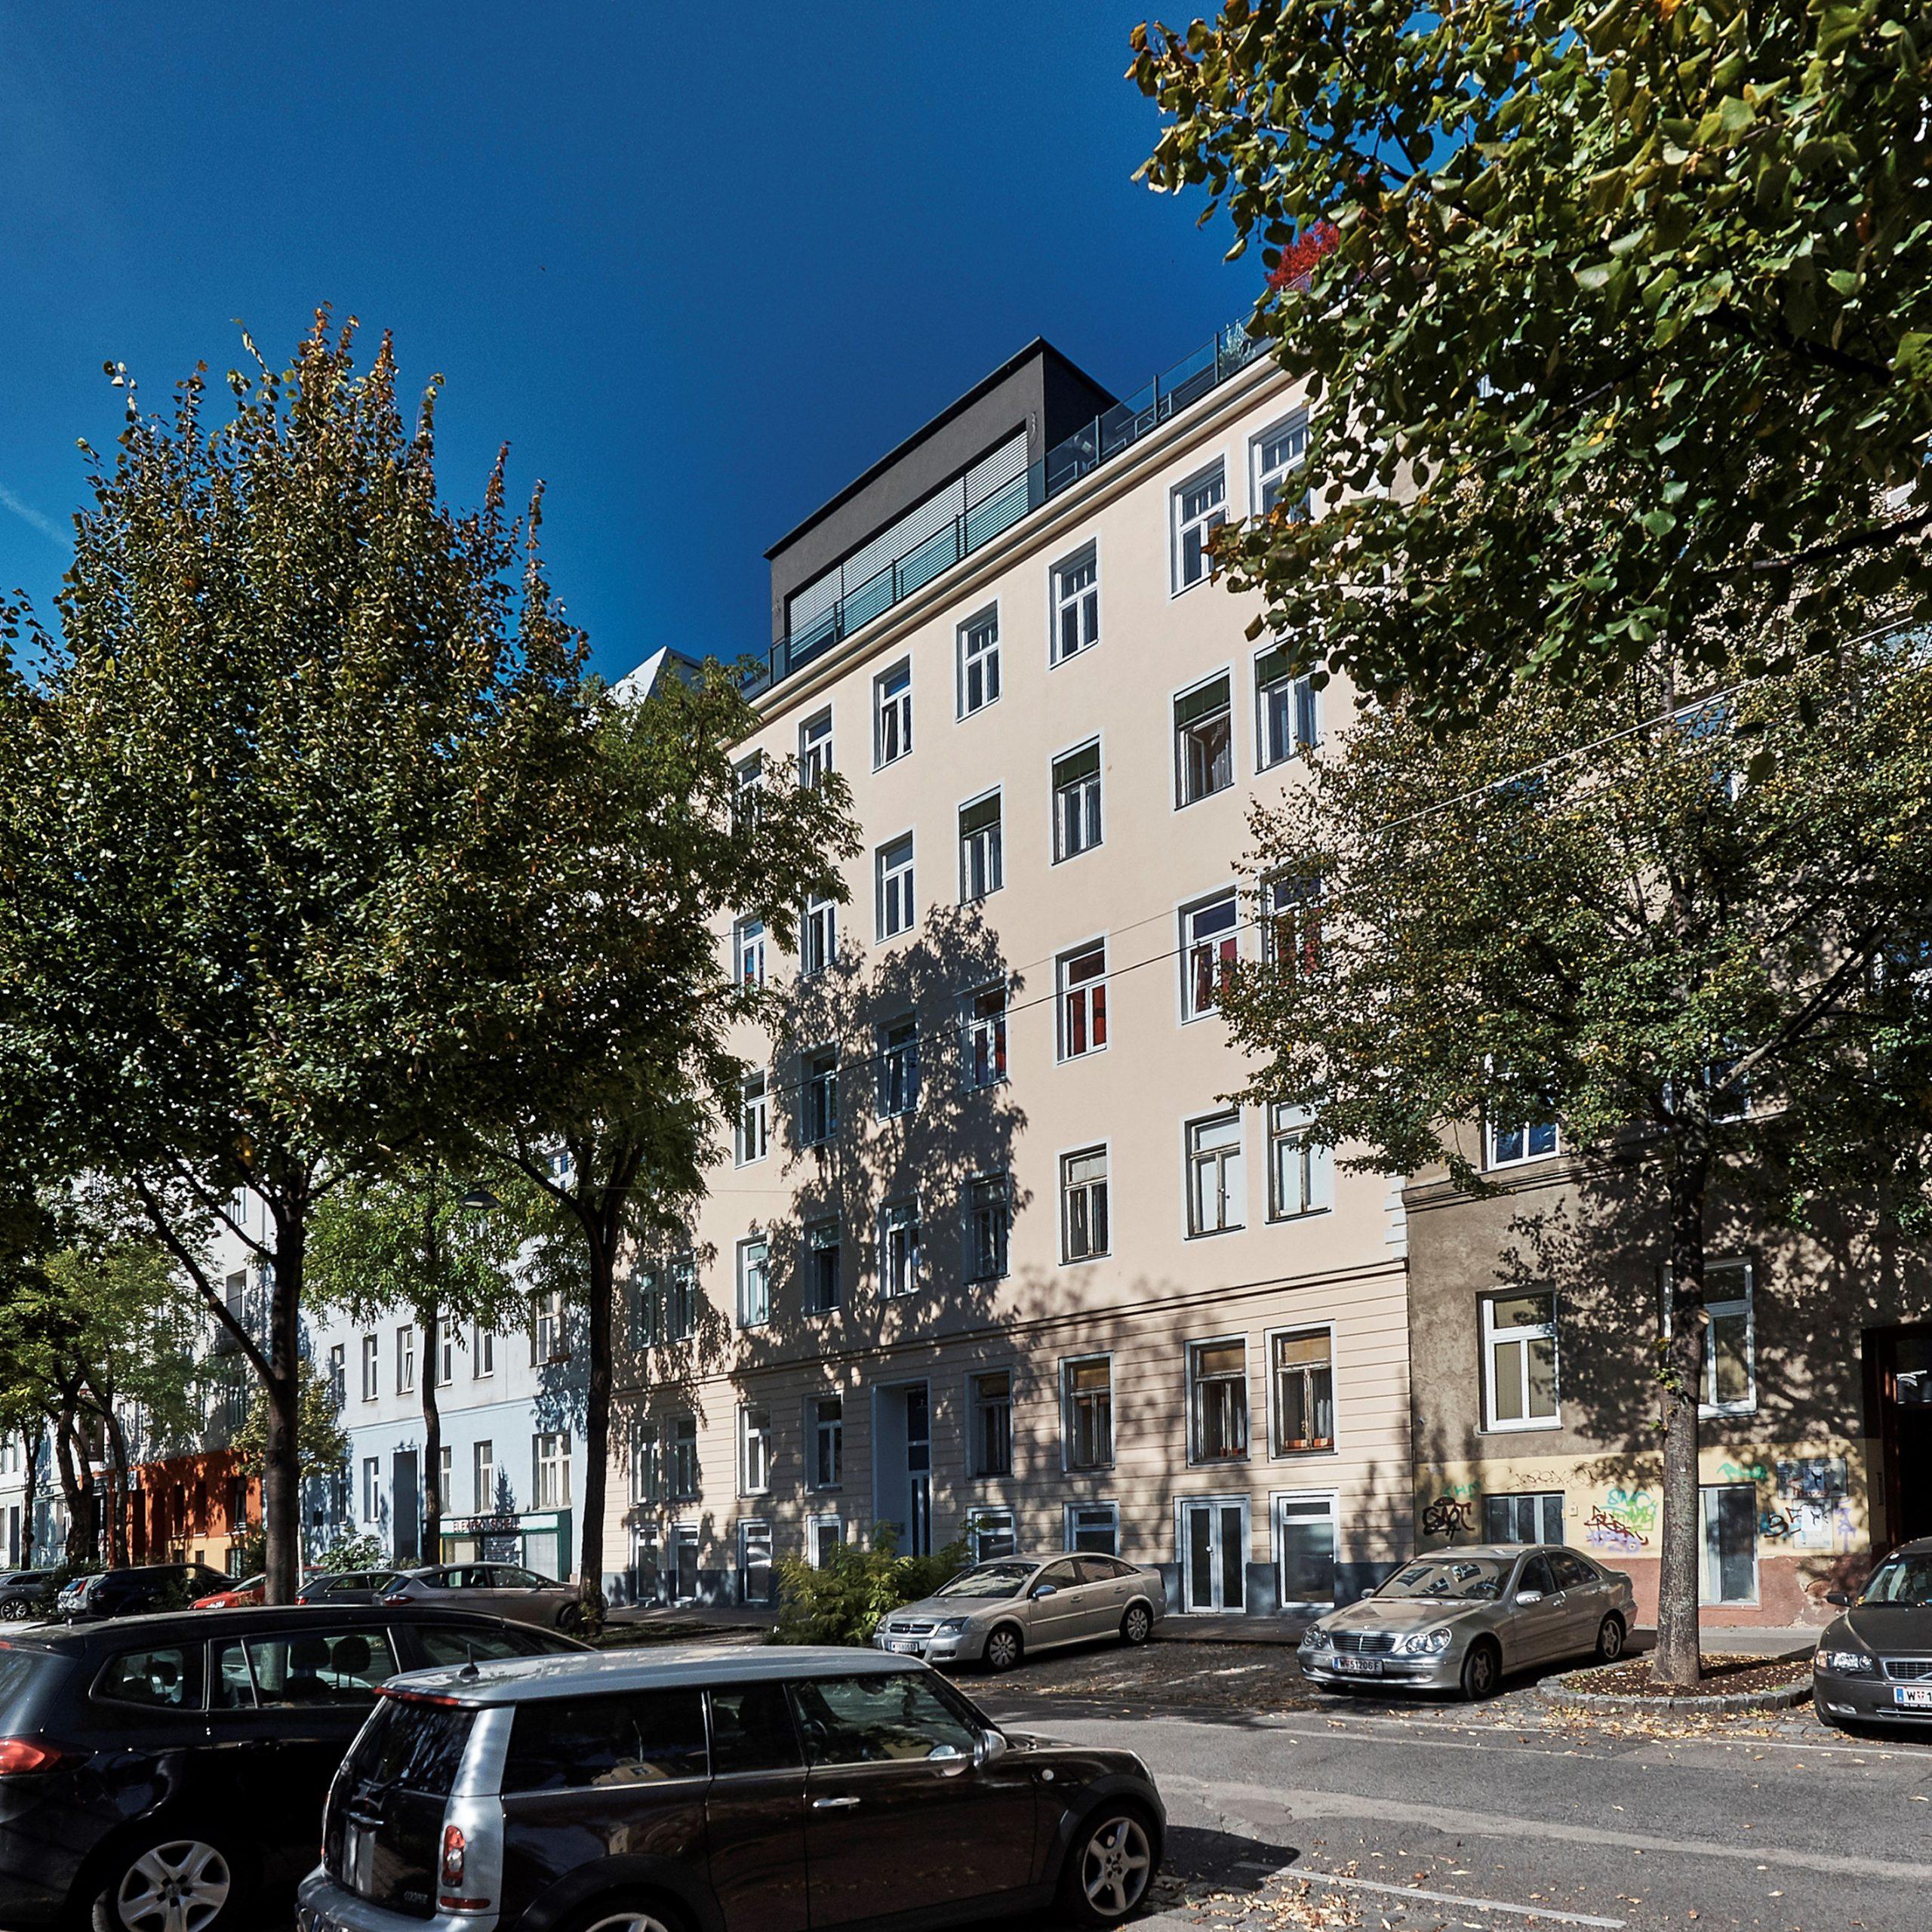 2020 1020 Max-Winter-Platz